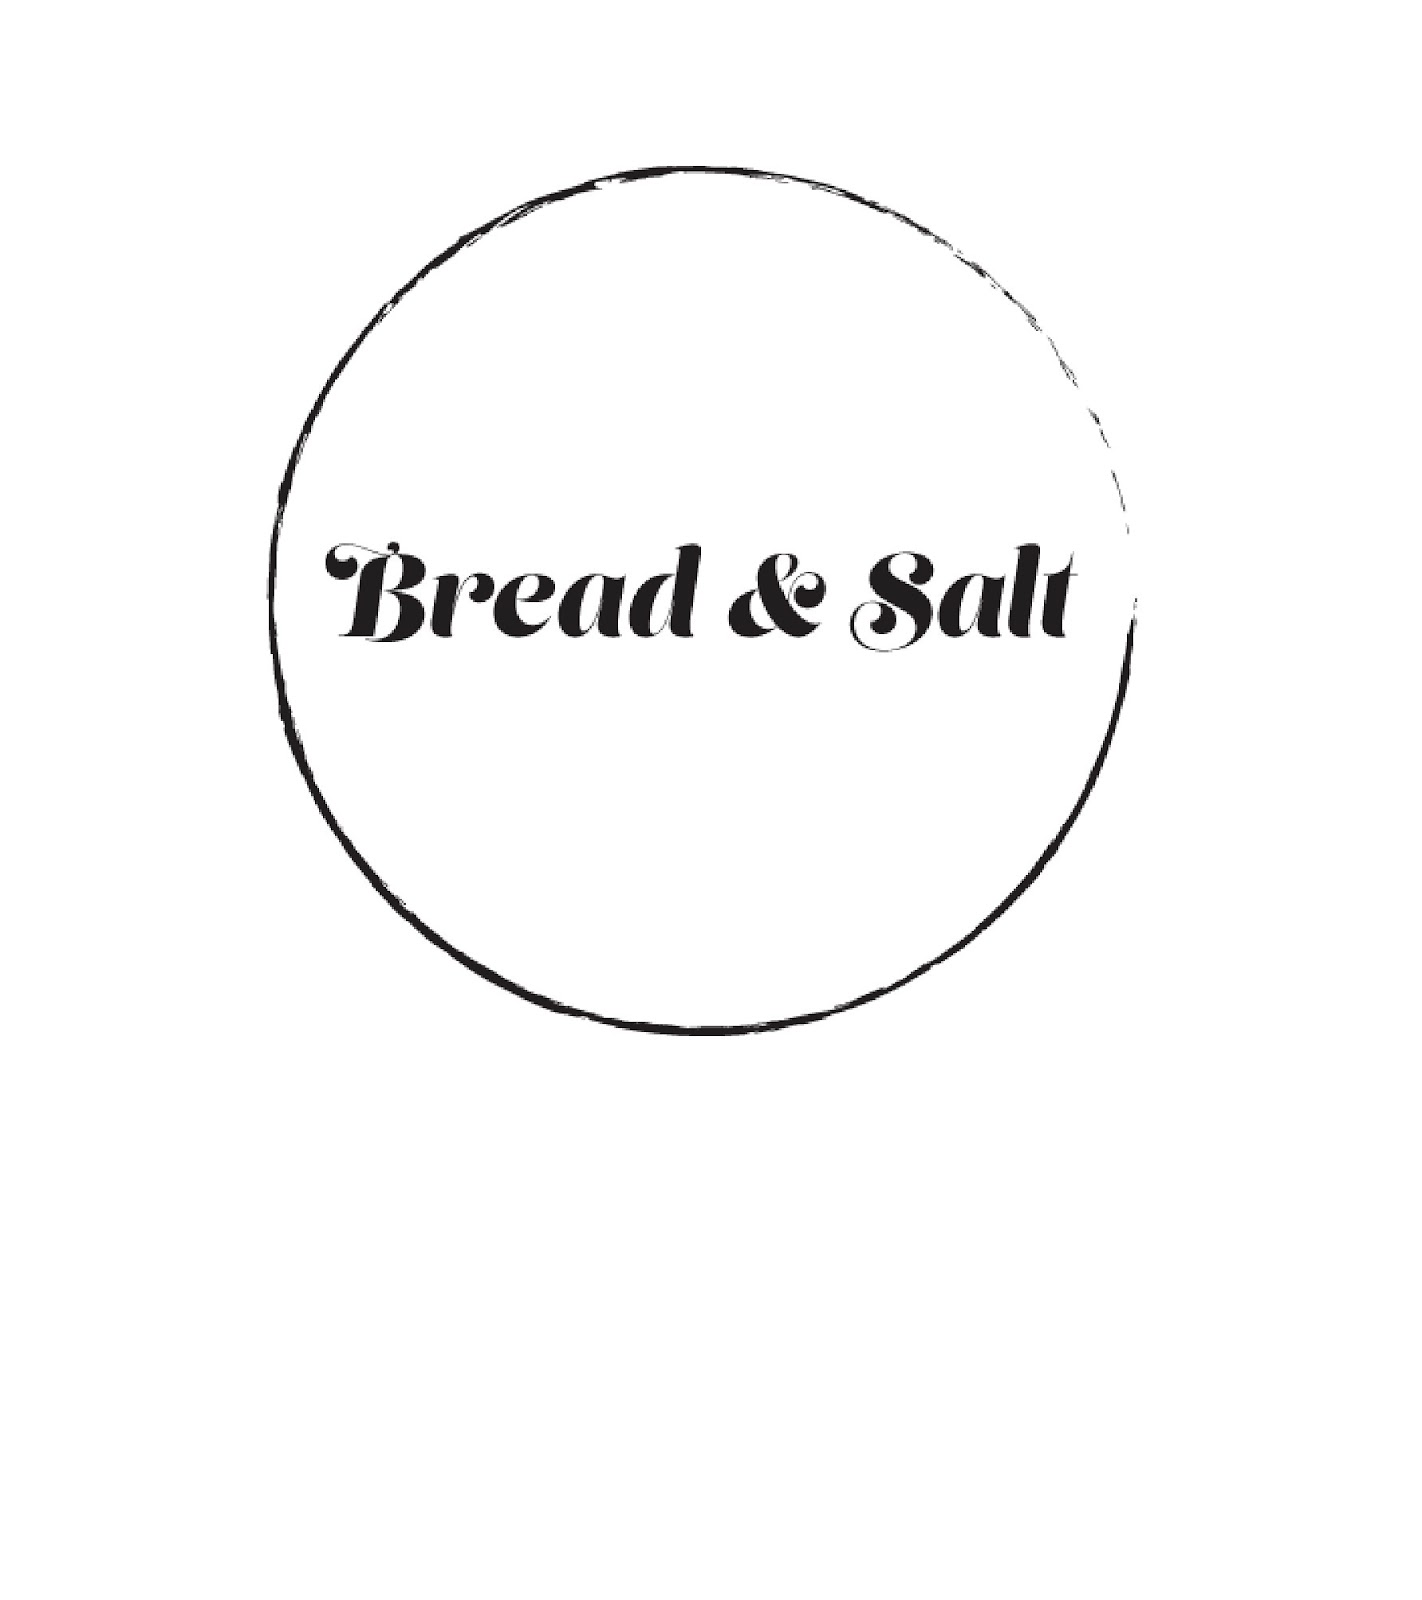 bread&salt logo.jpg